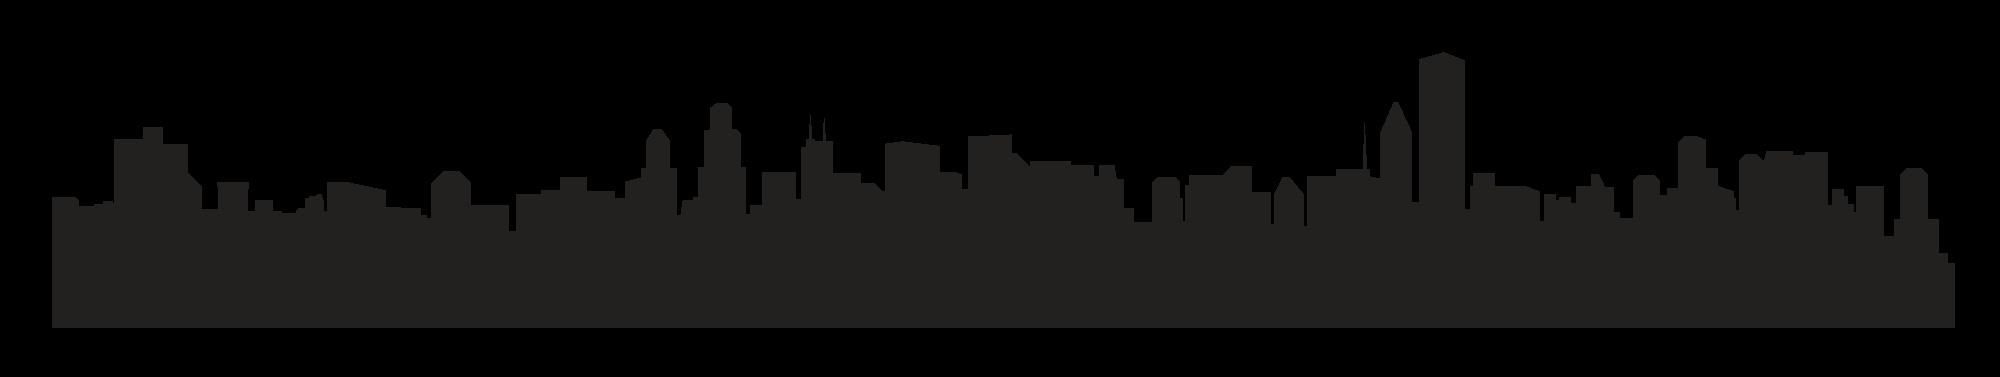 2000x377 Background Clipart City Skyline